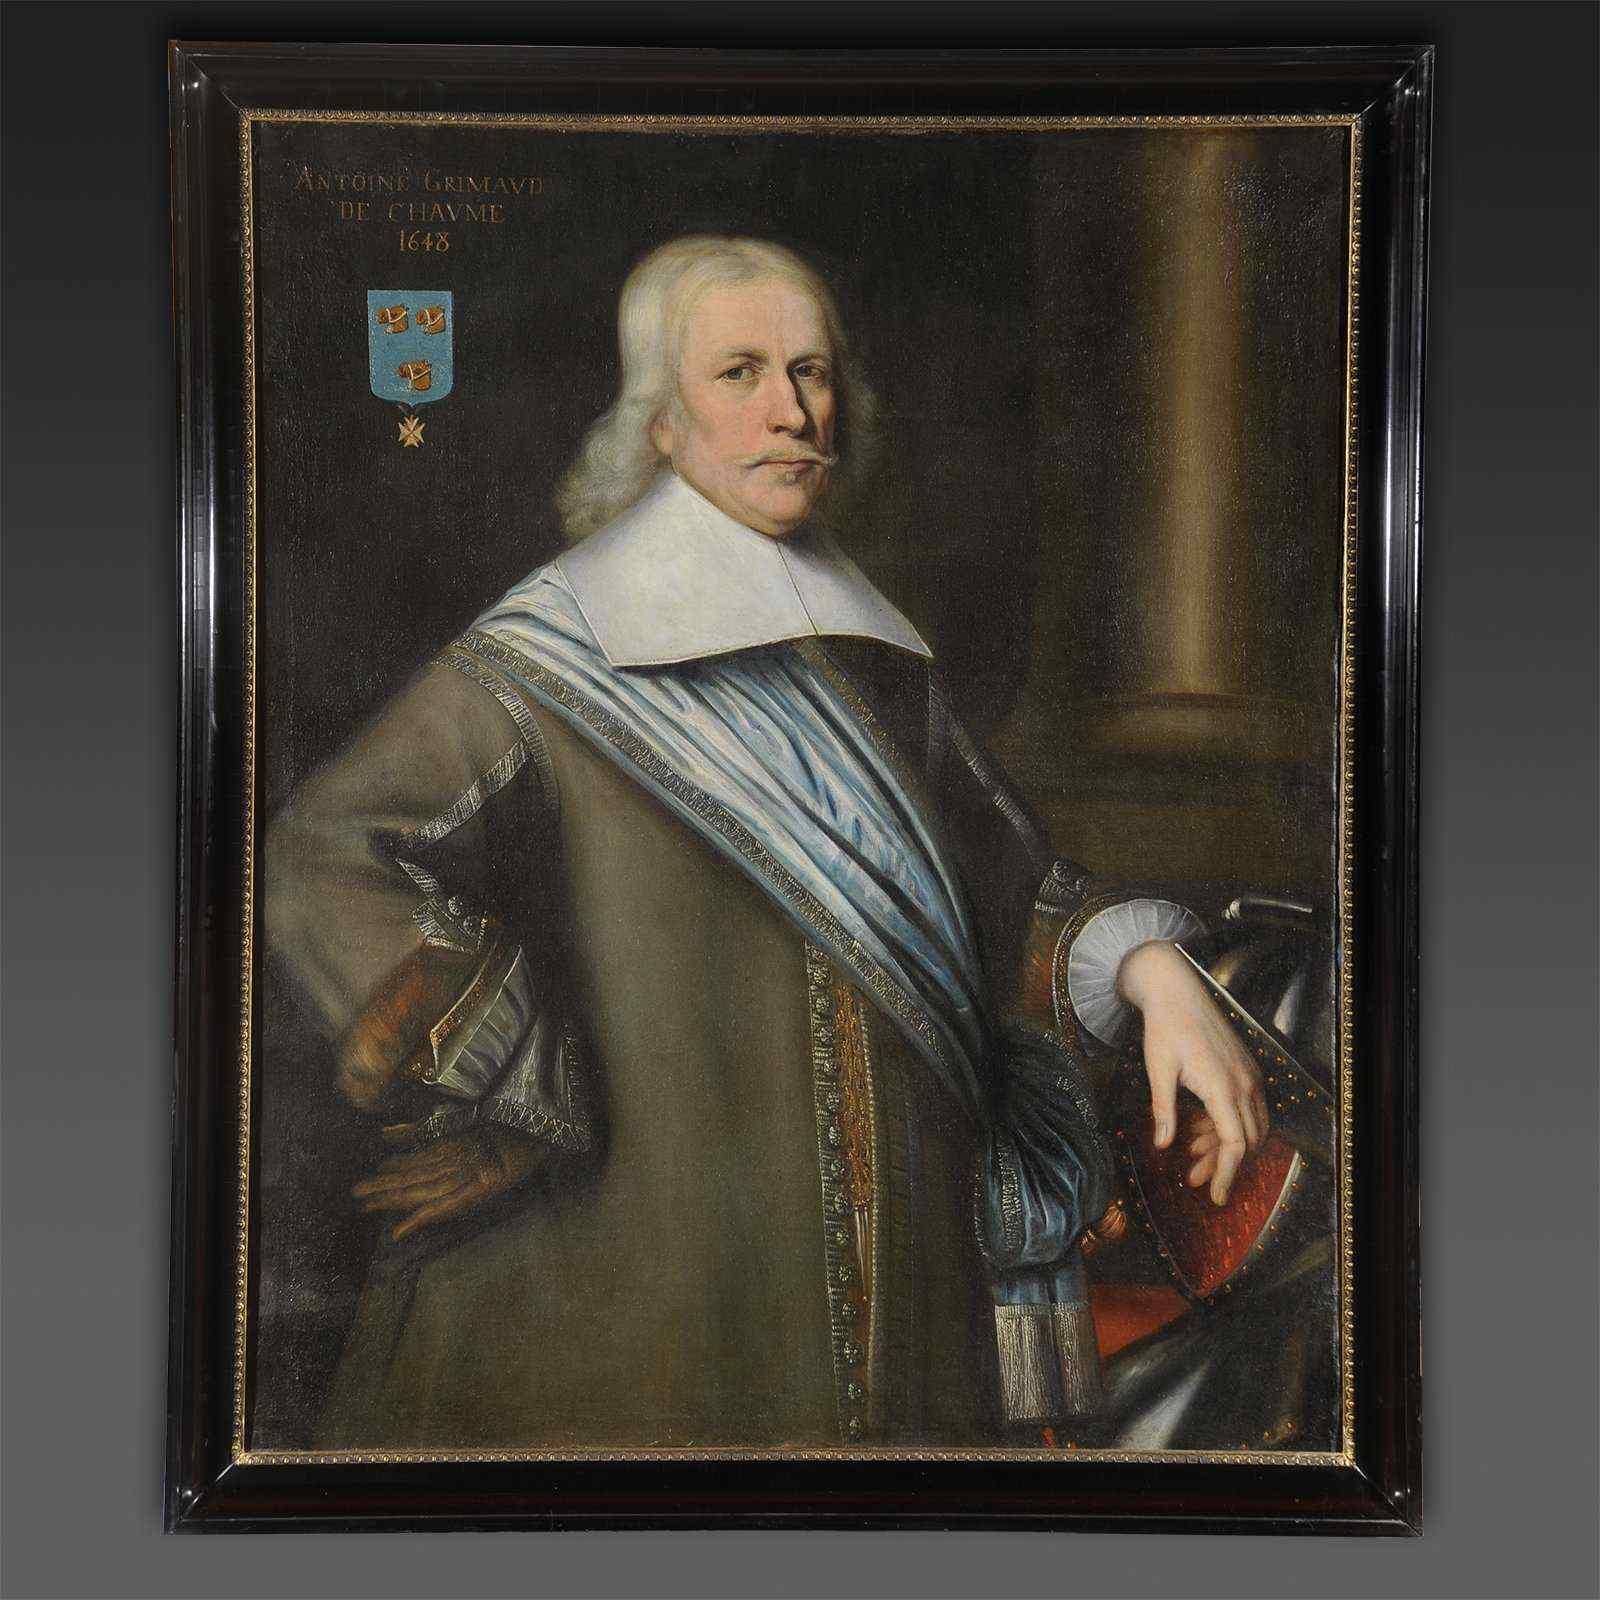 Bartholomeus van der Helst (Arround), Portrait of Antoine Gr